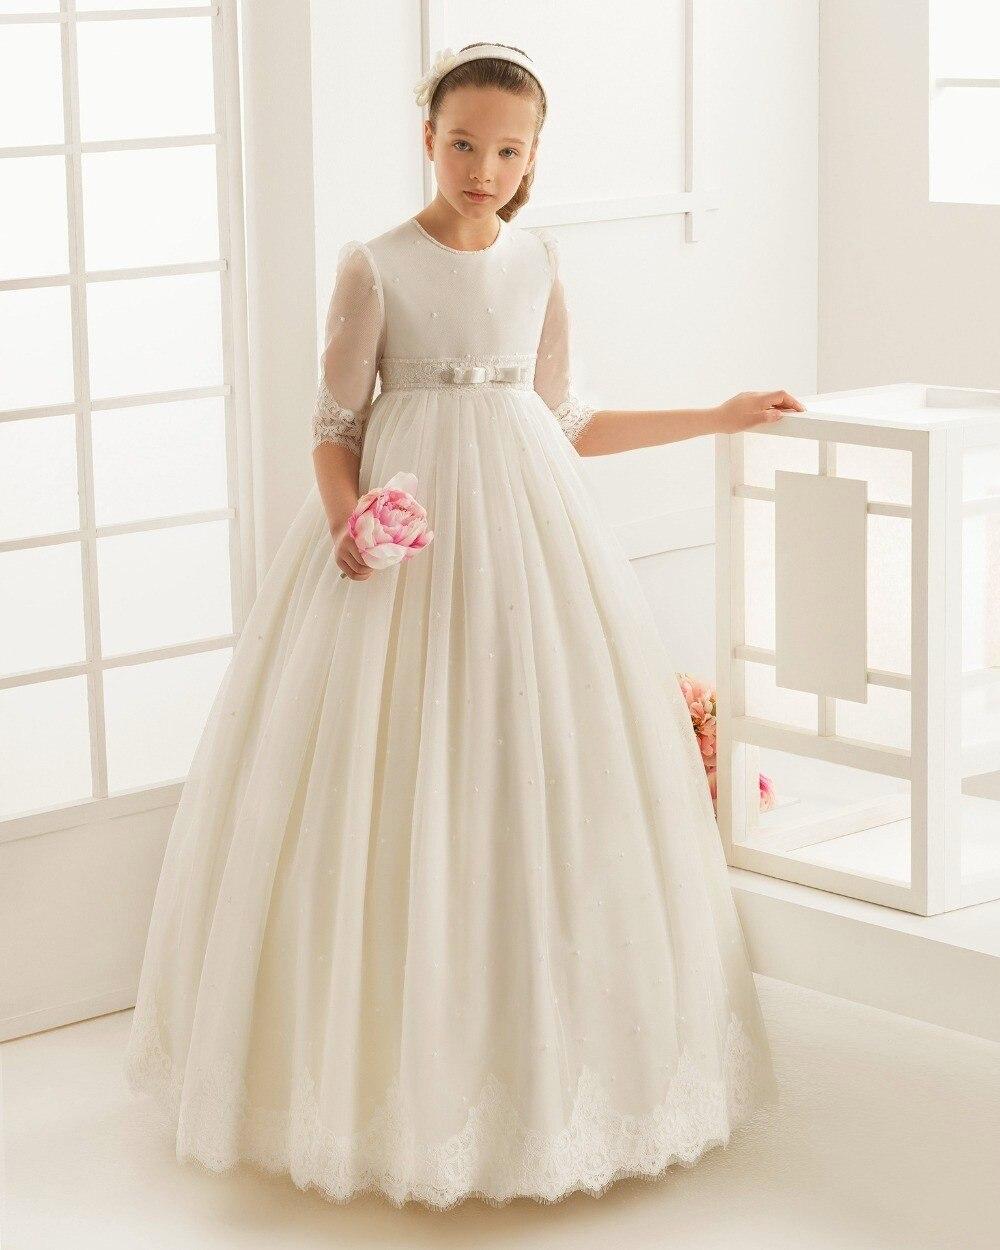 2017 Flower Girl Dresses for weddings first communion dresses for girls Tulle A-Line girls pageant dresses cute